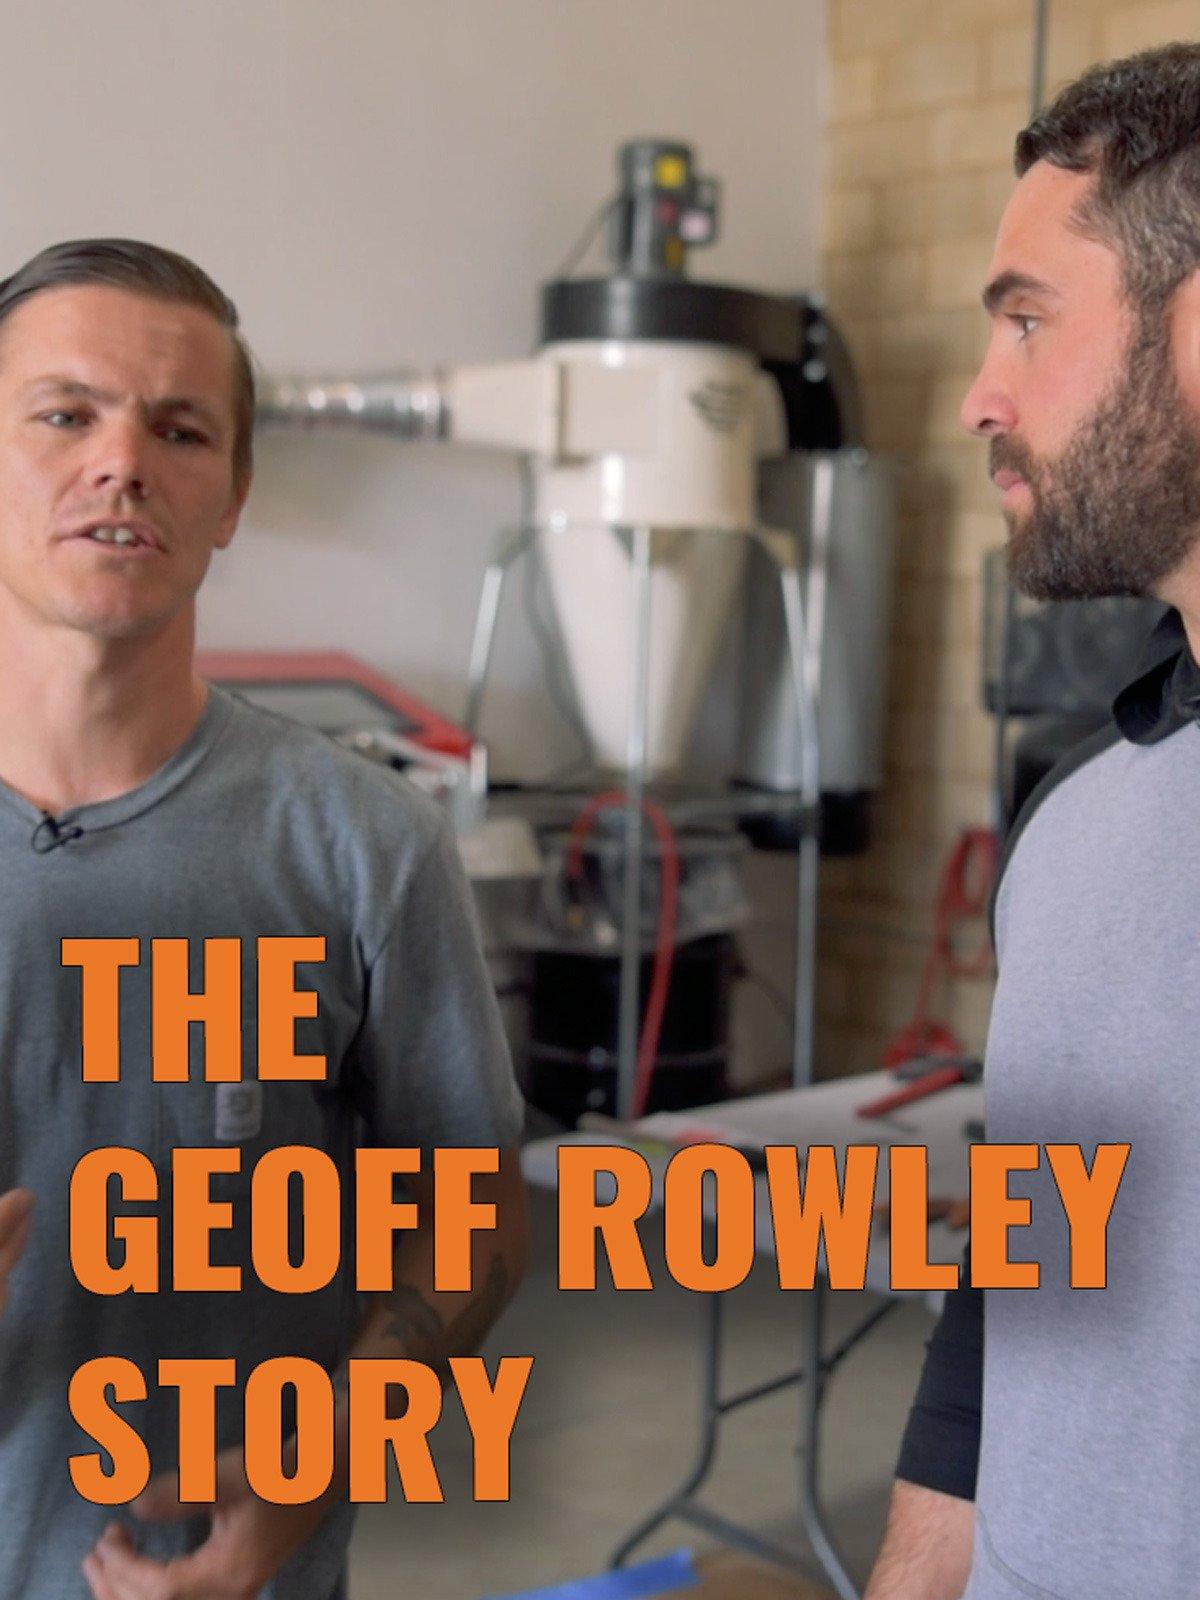 The Geoff Rowley Story